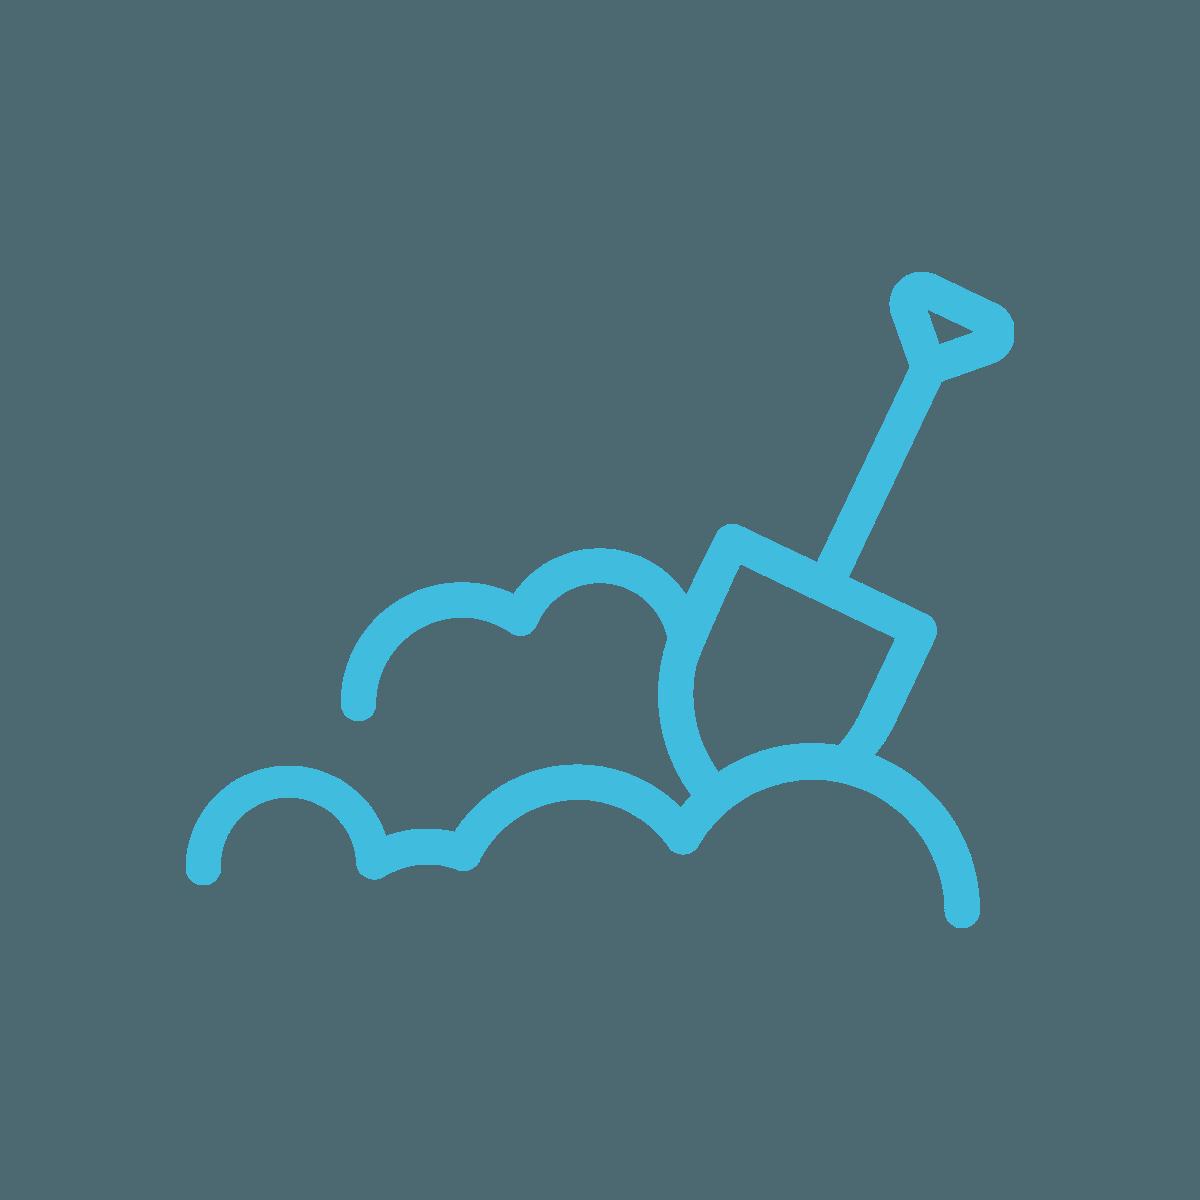 icon-shovel